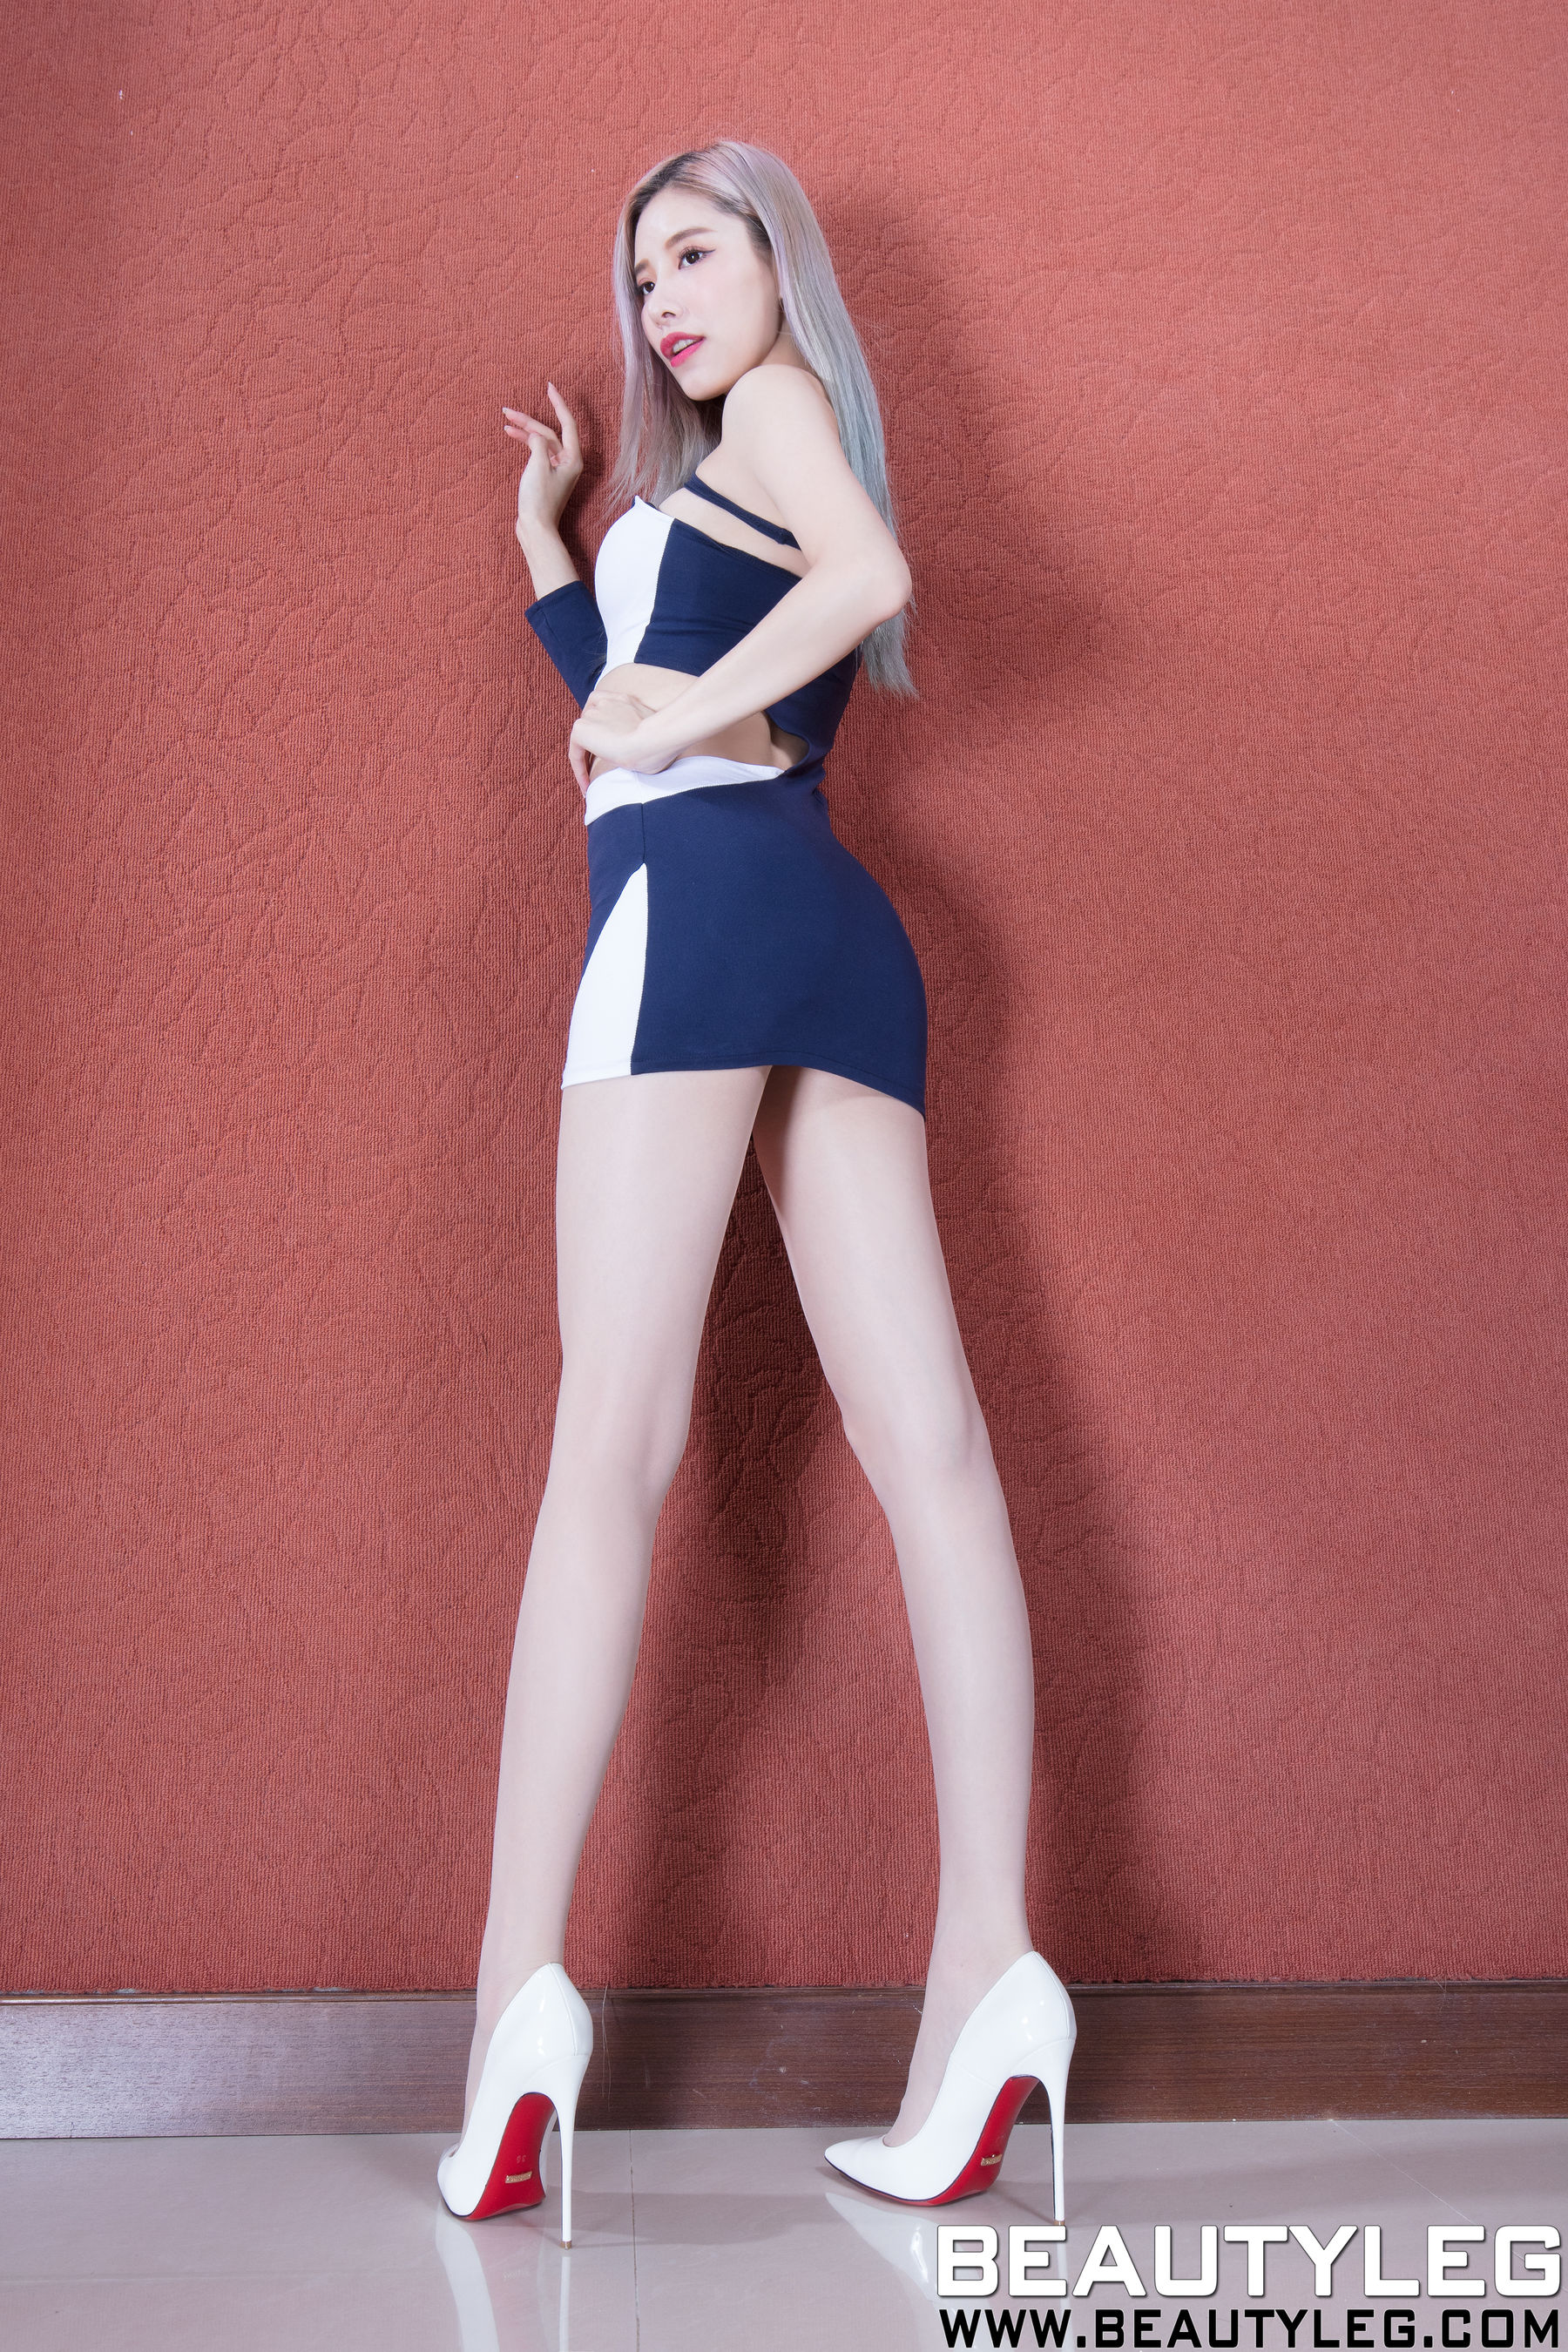 VOL.1744 [Beautyleg]丝袜美腿包臀裙美女长腿美女:陈玉雪(腿模Abby)超高清个人性感漂亮大图(43P)